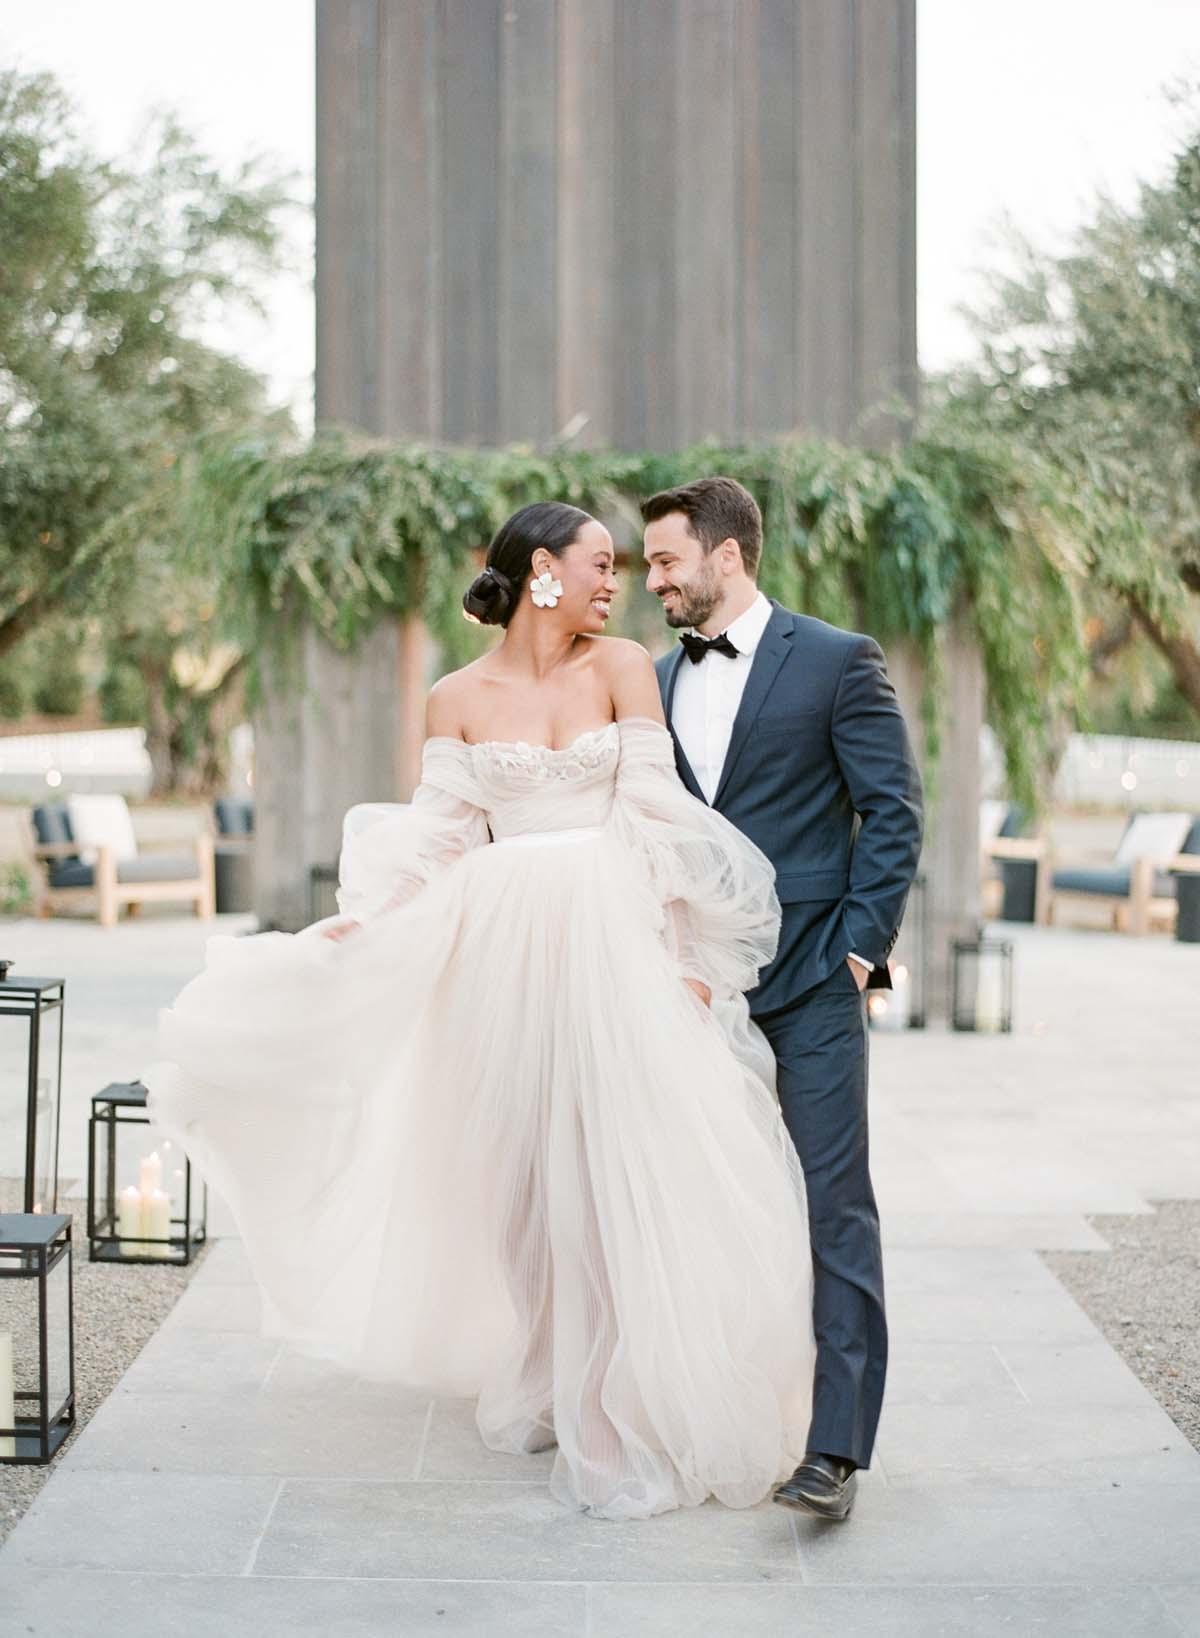 XOXO_BRIDE_Events-Michelle-Beller_Photography_0121